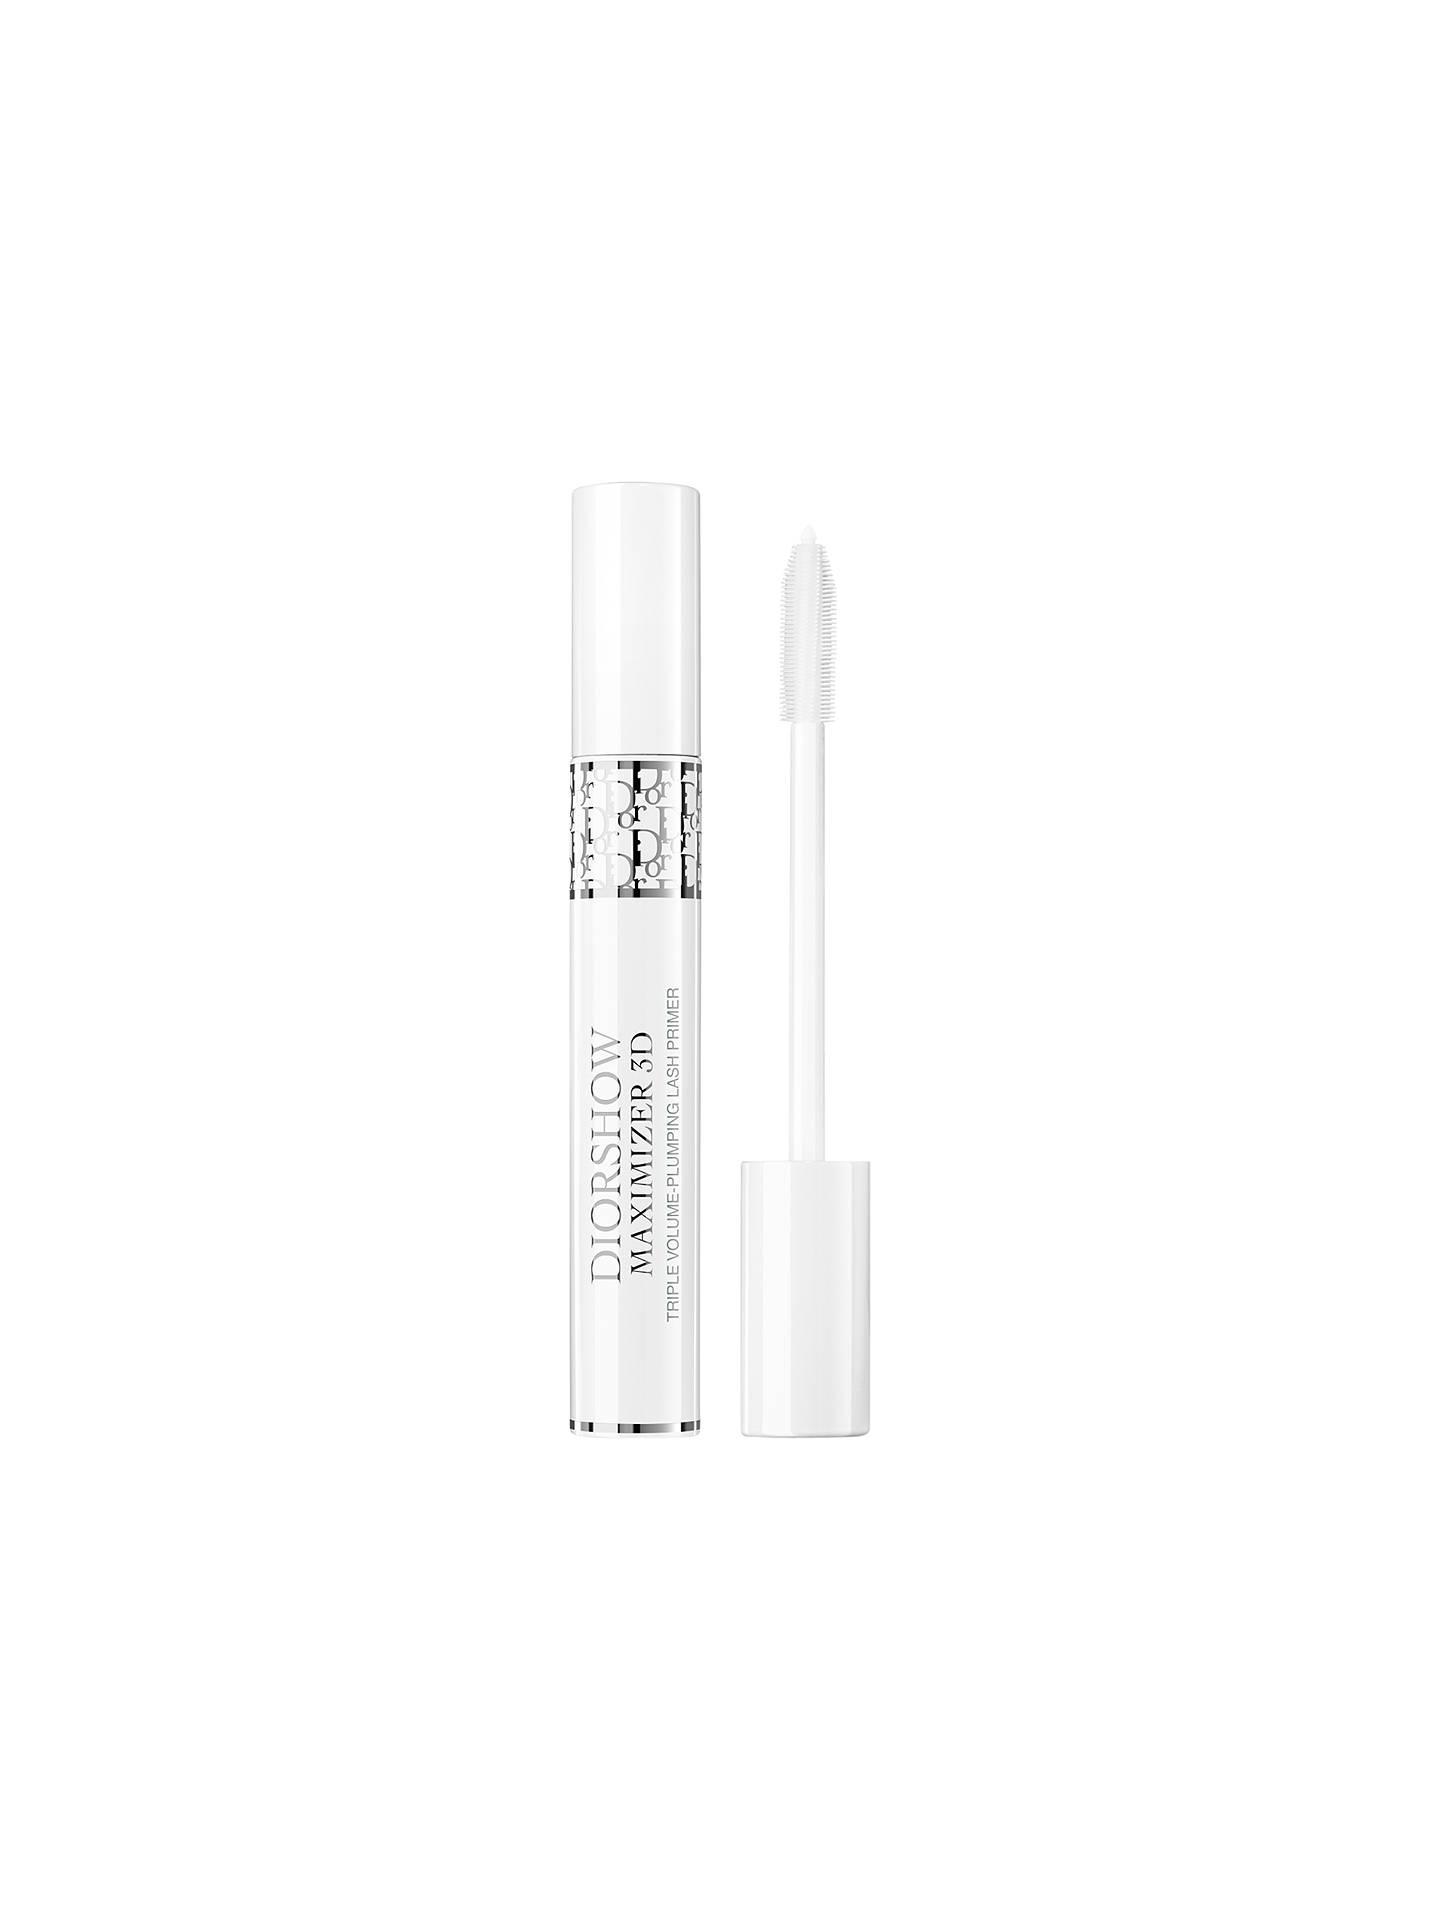 https://www.ulta.com/eyelash-enhancing-serum?productId=xlsImpprod1640391